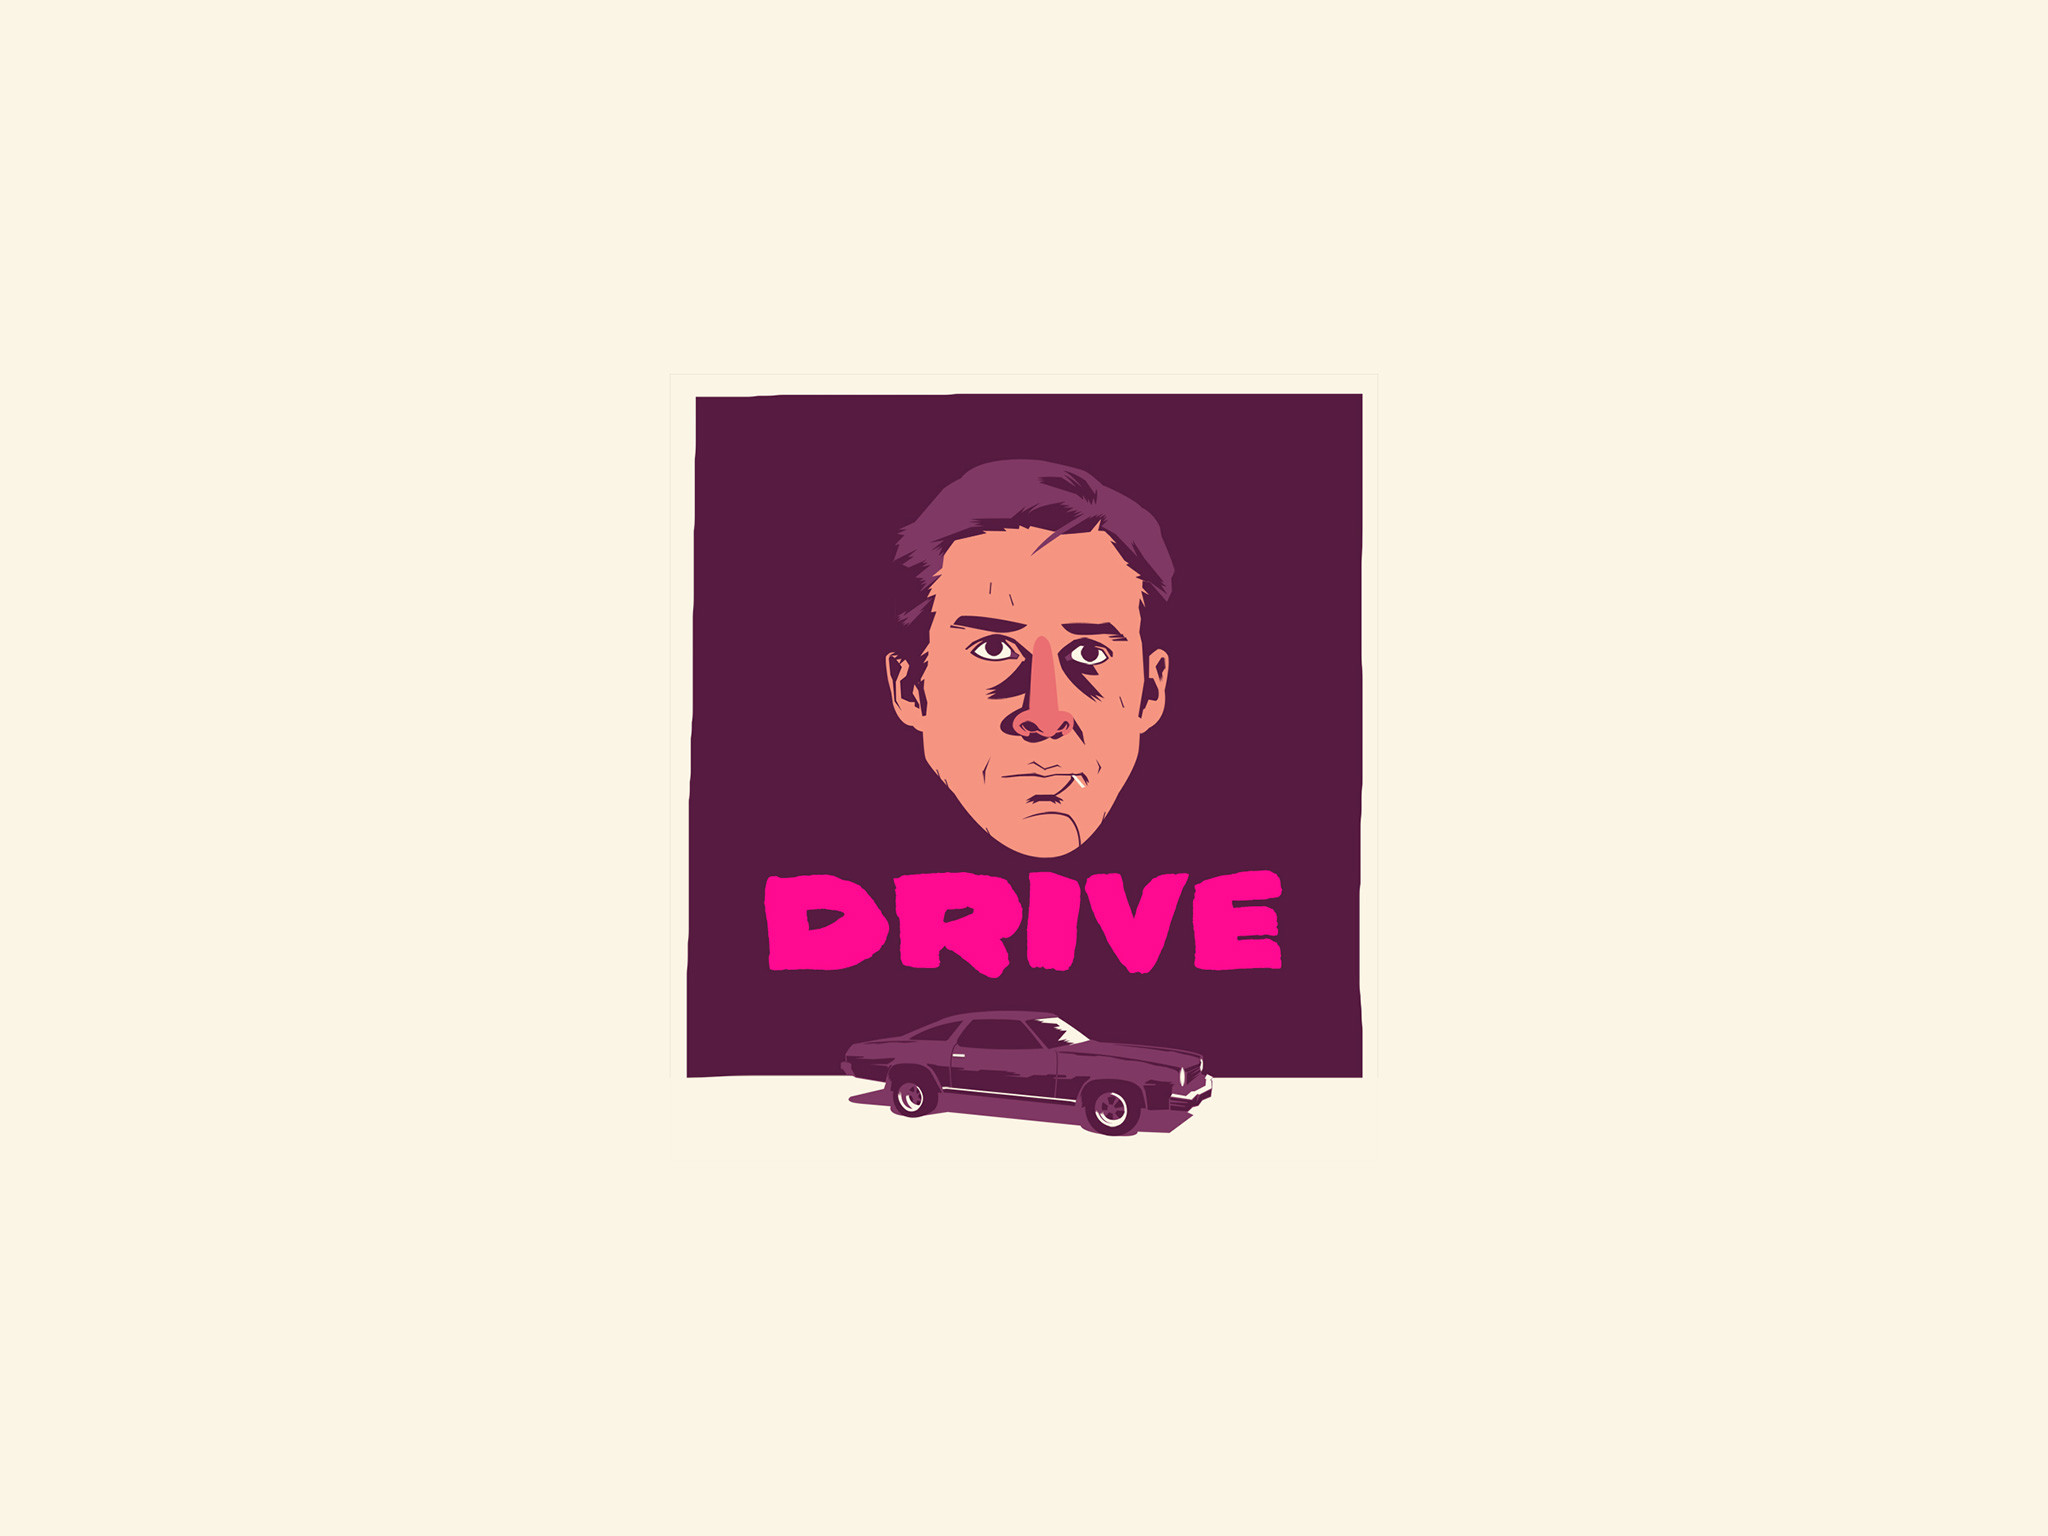 Download Drive Movie Free Retina Wallpaper For iPad